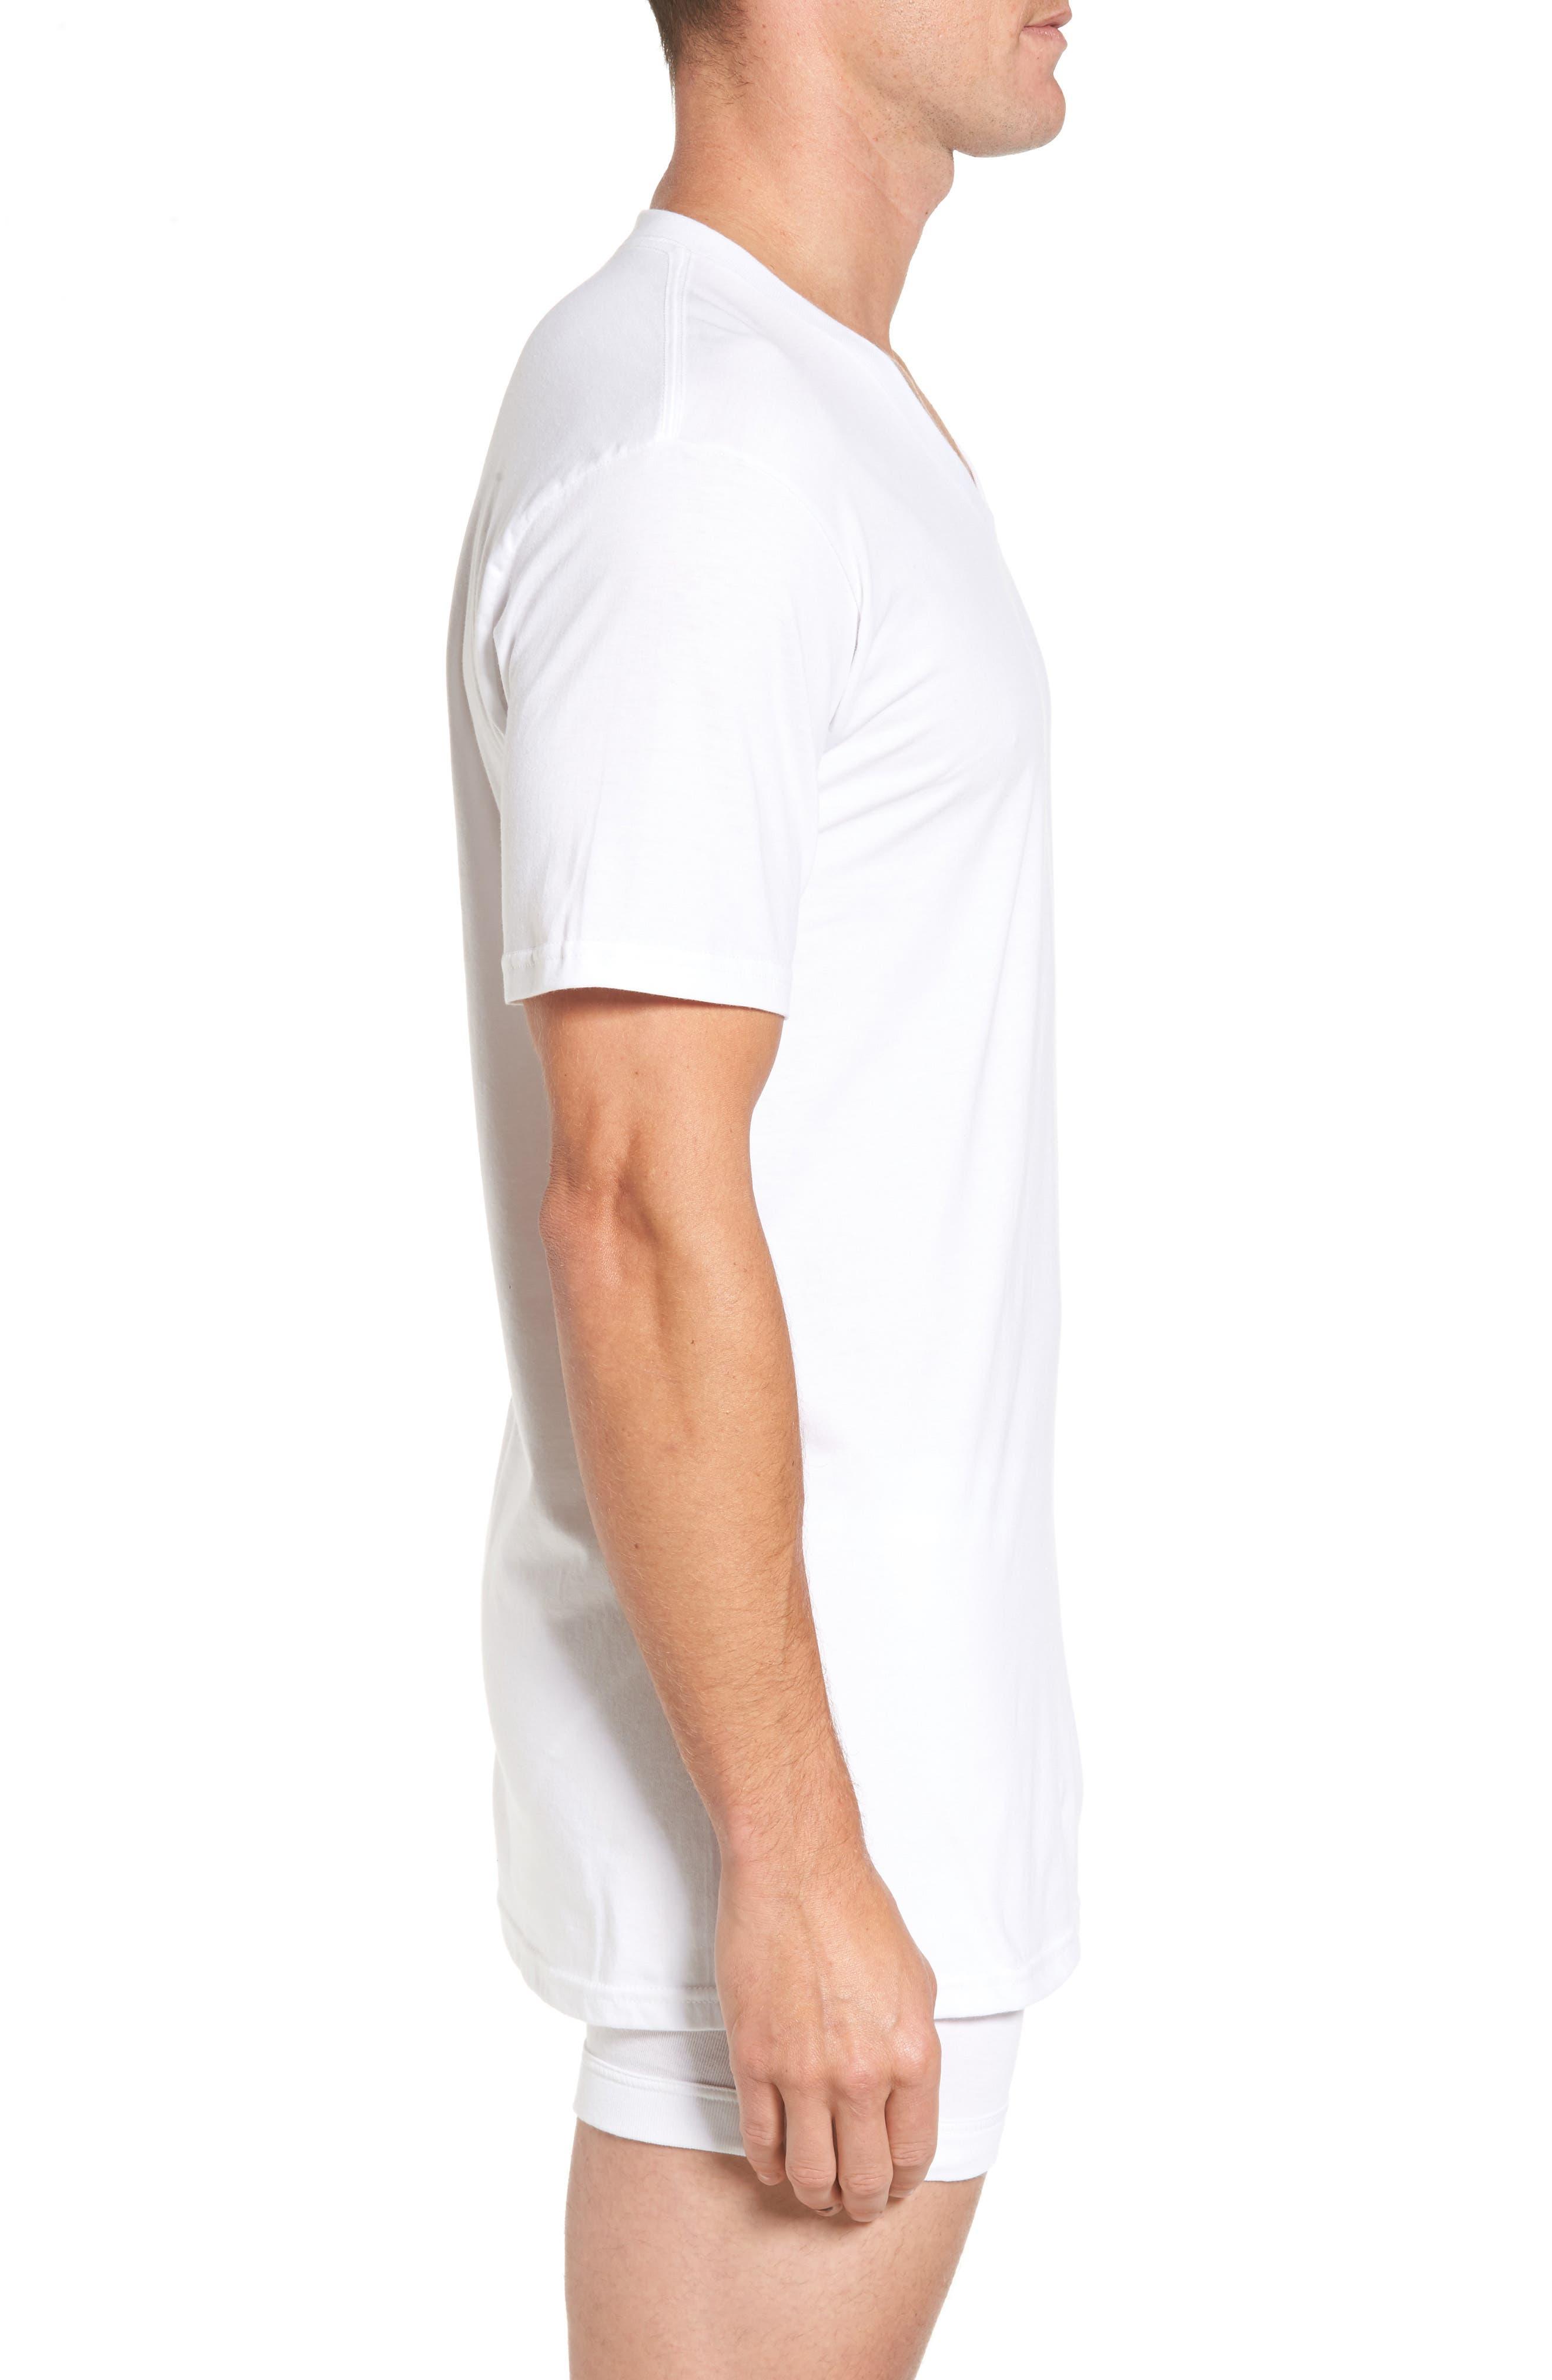 NORDSTROM MEN'S SHOP, 4-Pack Regular Fit Supima<sup>®</sup> Cotton V-Neck T-Shirts, Alternate thumbnail 3, color, WHITE